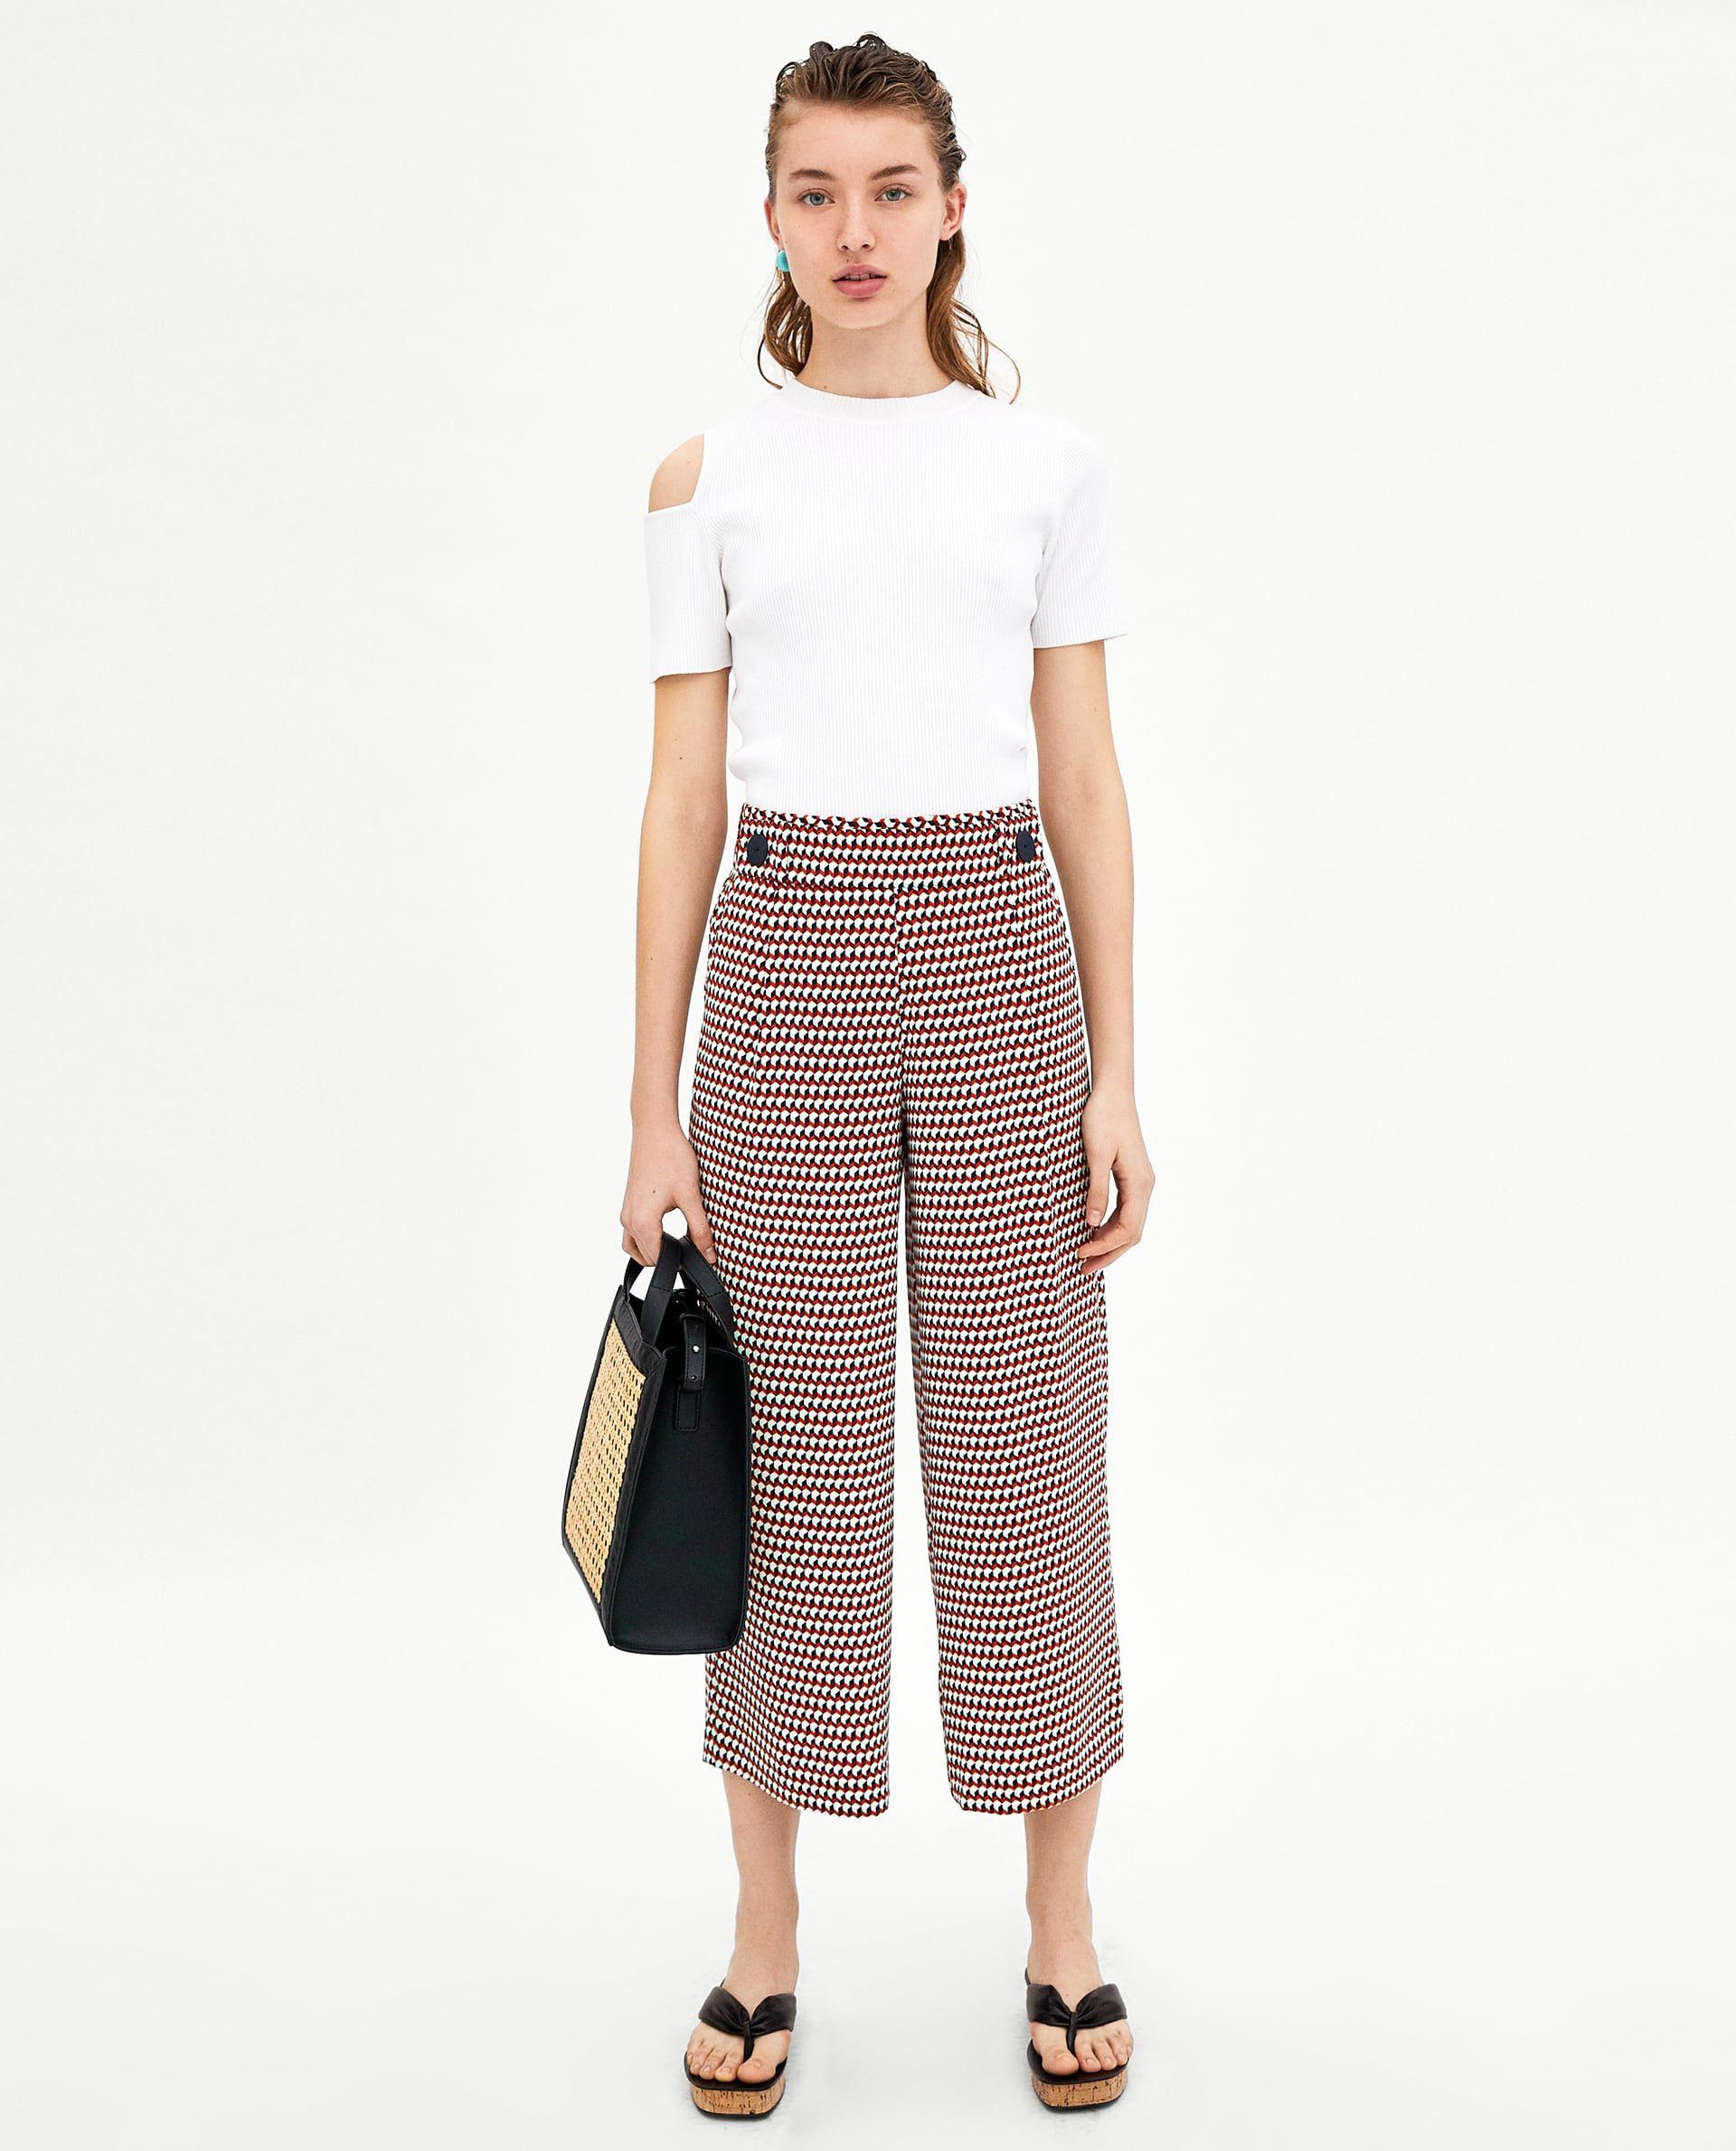 1766337c3b5 PANTALÓN FLUIDO TOBILLERO | ZARA | Zara outfit, Cropped pants ...